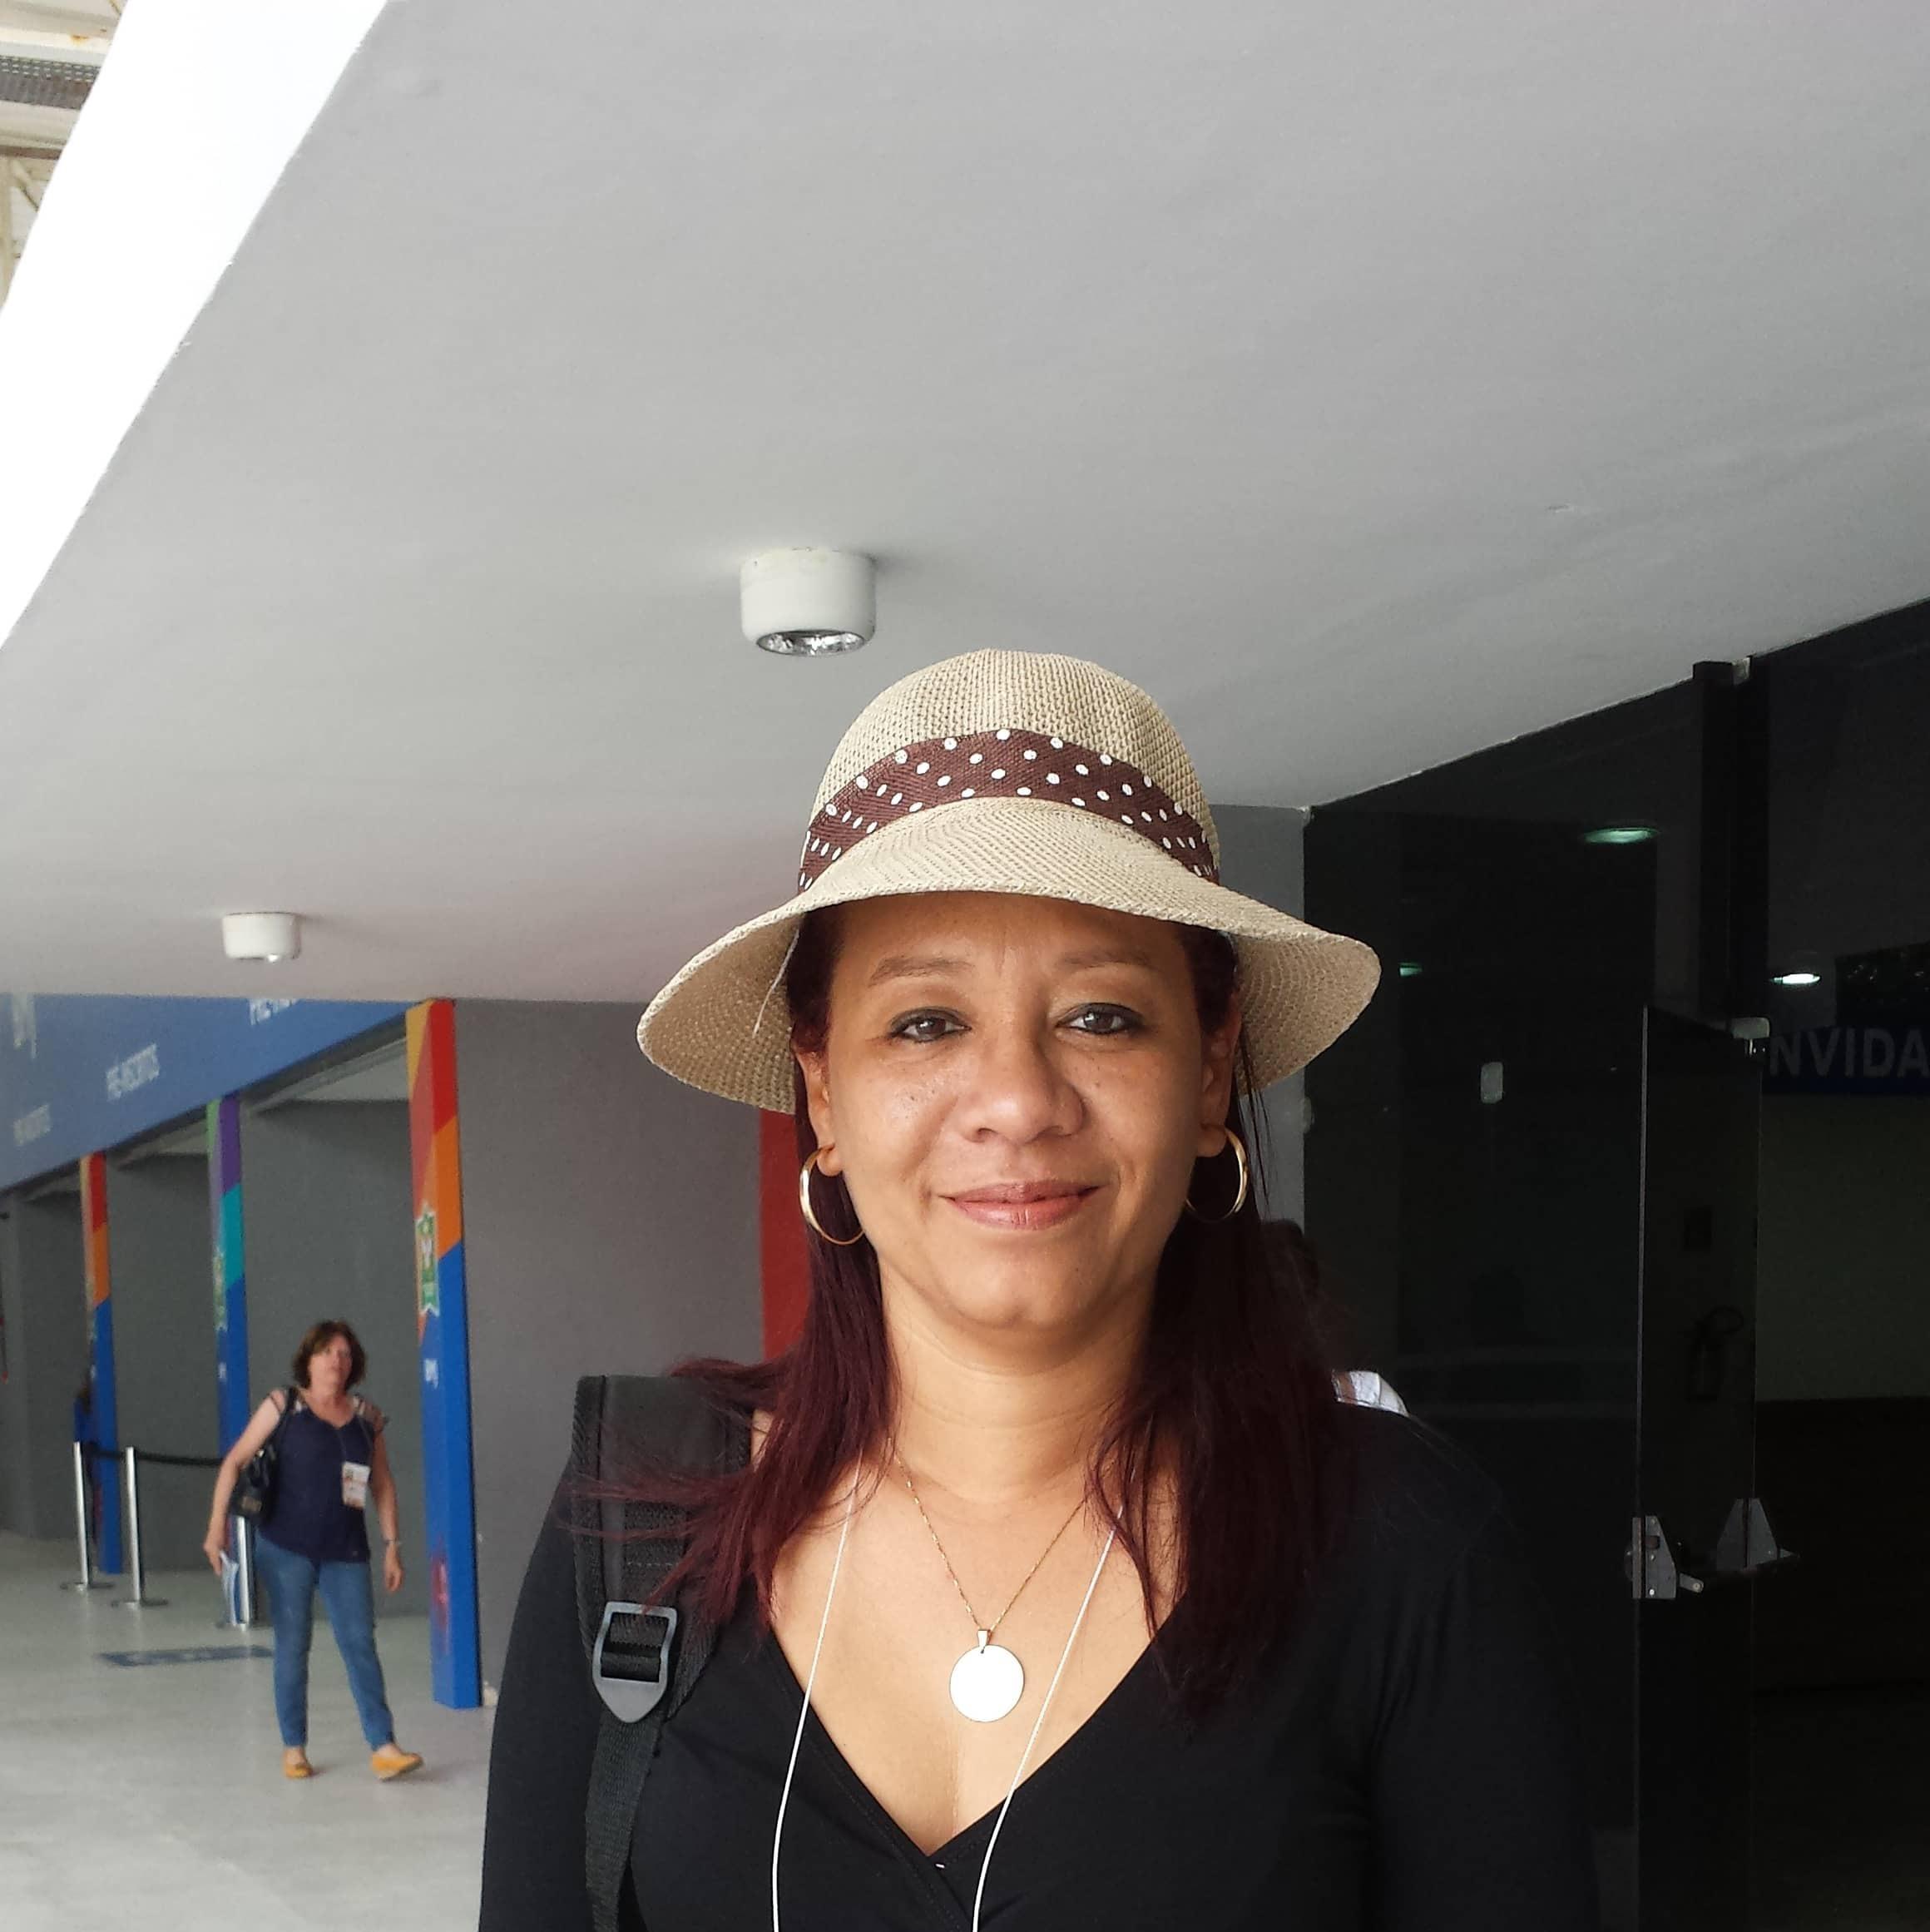 Ivonne Sánchez Sastre